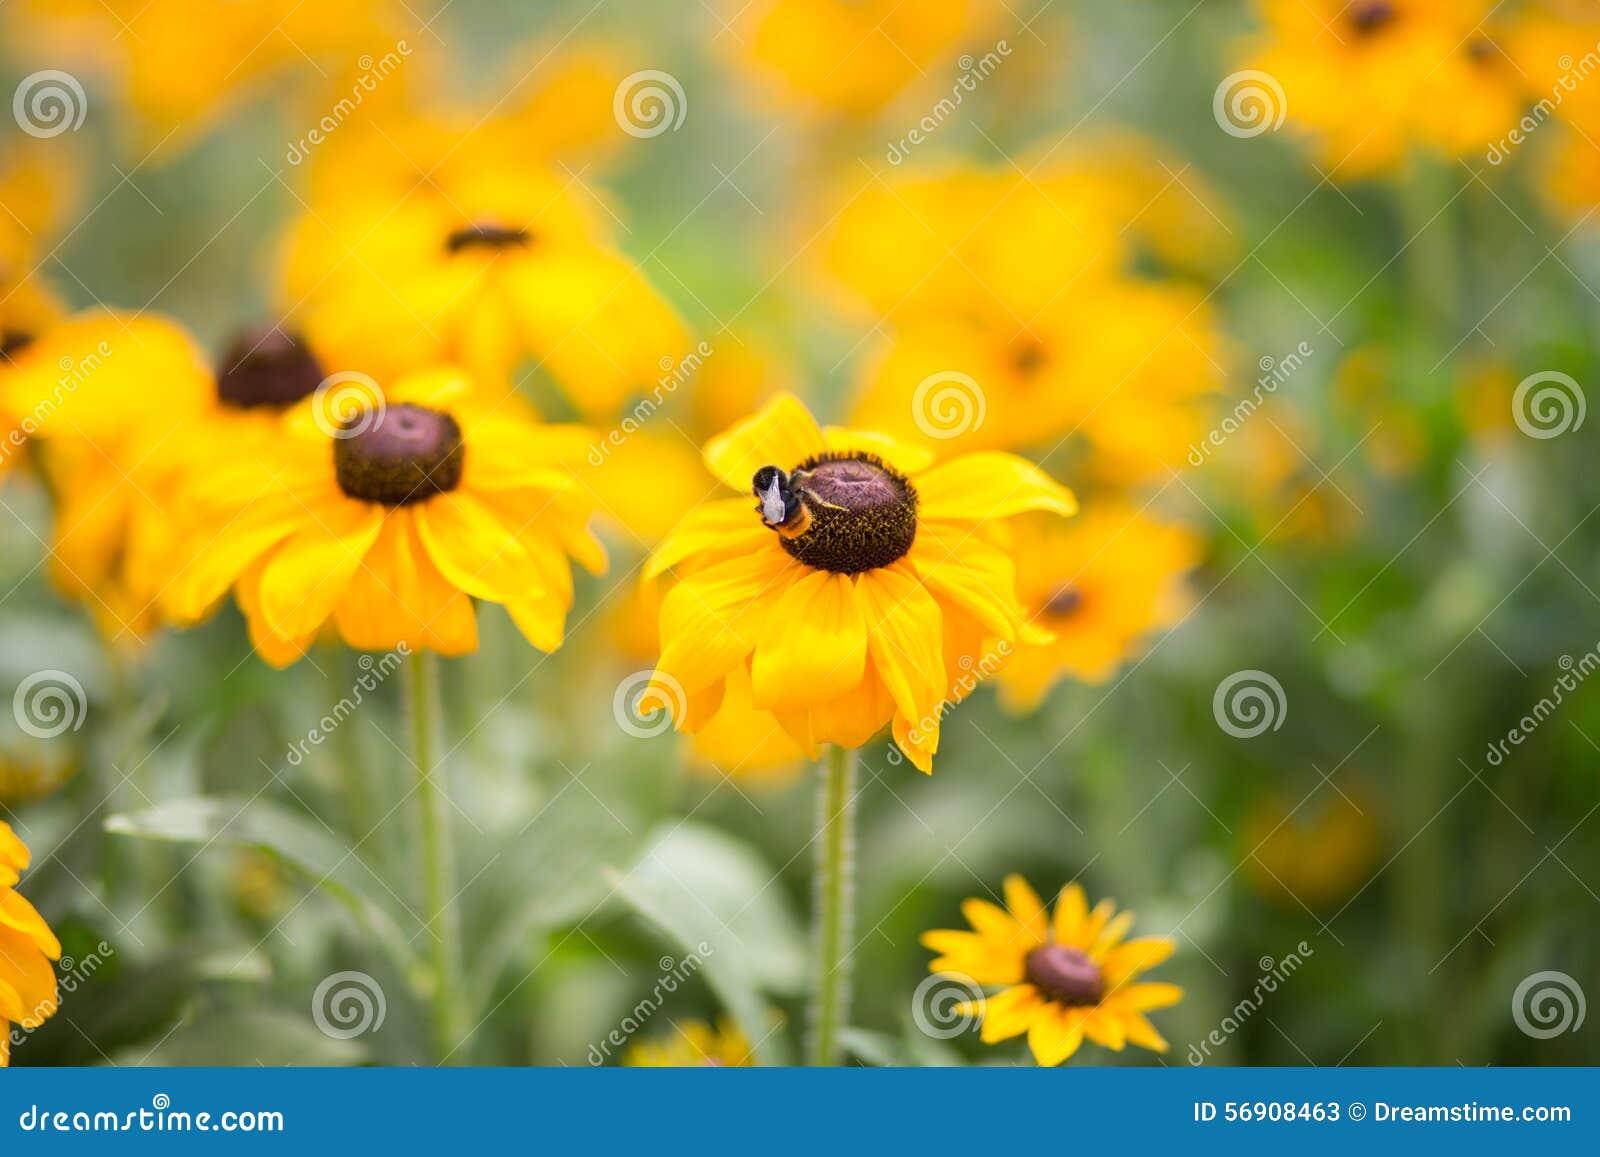 Hirta Rudbeckia, μαύρος-eyed-Susan - εικόνα αποθεμάτων